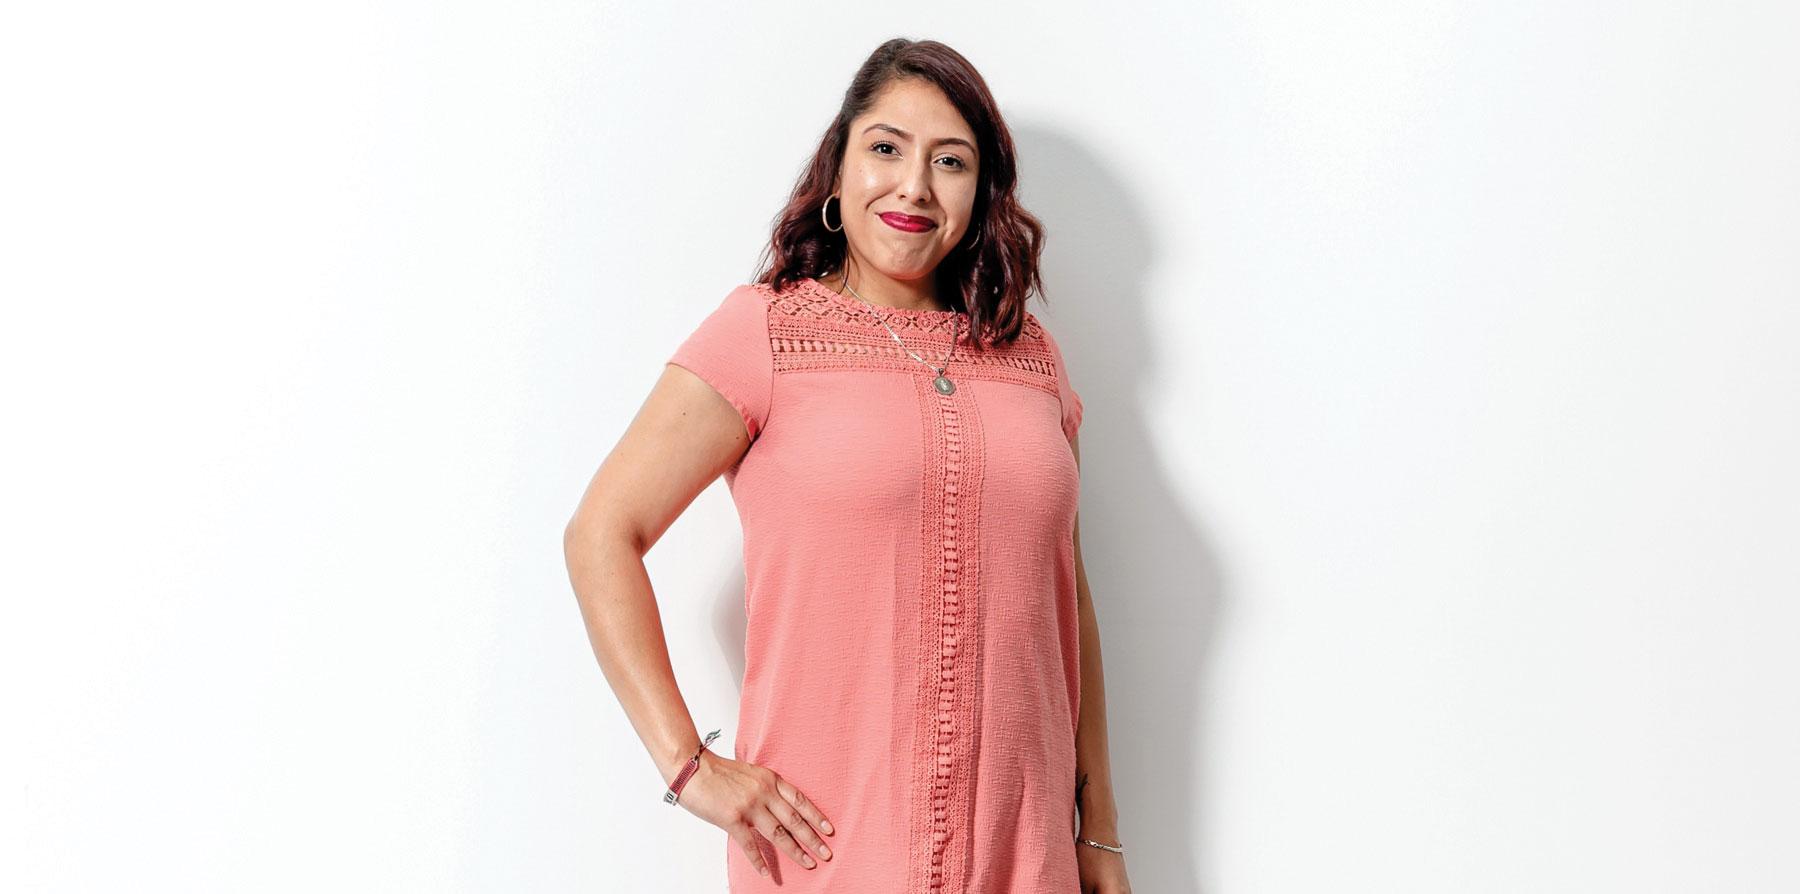 Natalia Montelongo entre las Líderes de Coors Light